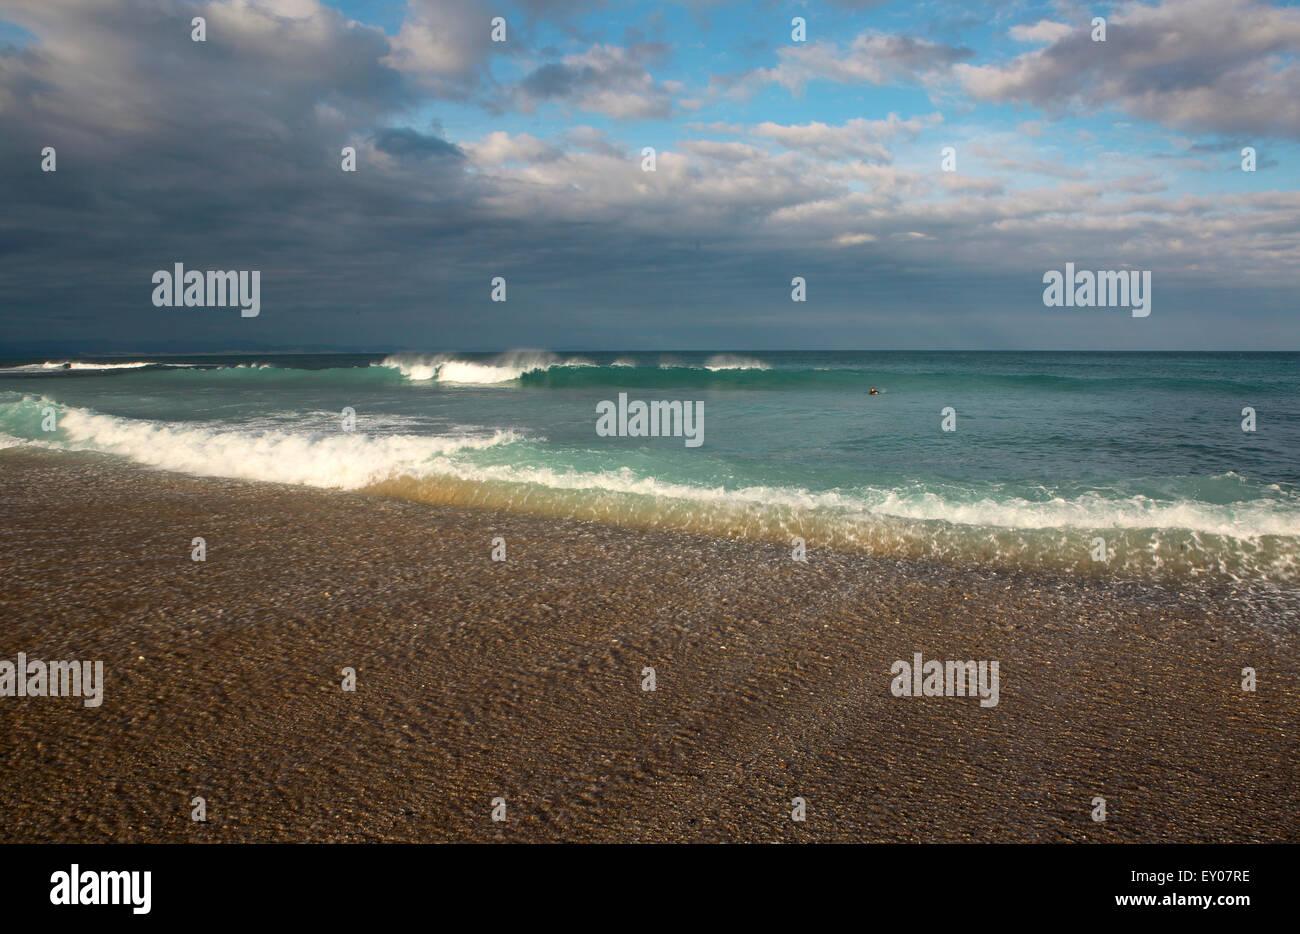 Meereswellen und Wolkengebilde am Sandstrand in Jeffreys Bay, Südafrika Stockbild